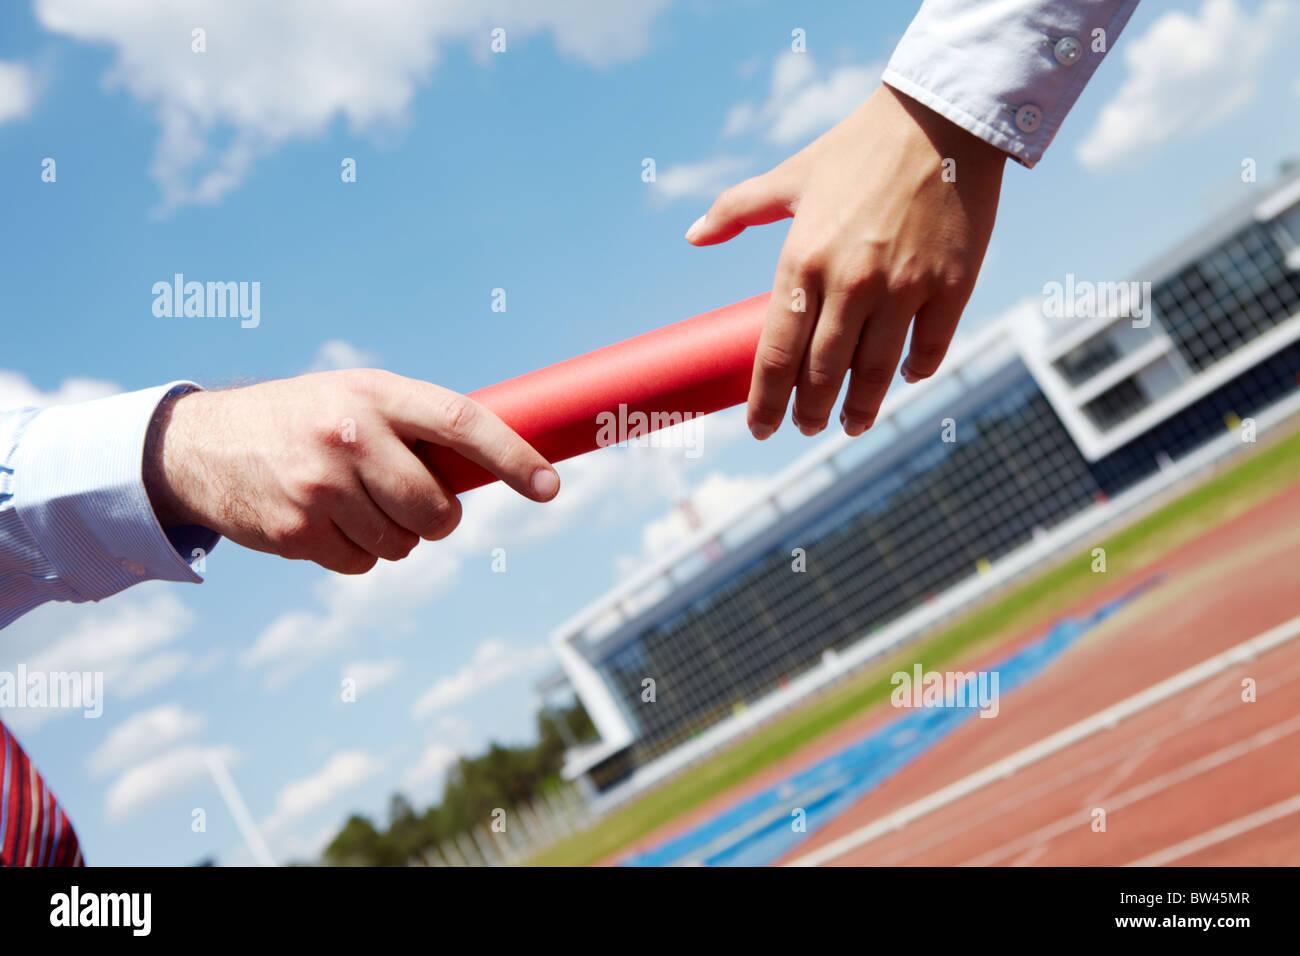 Photo of business people hands passing baton during marathon - Stock Image